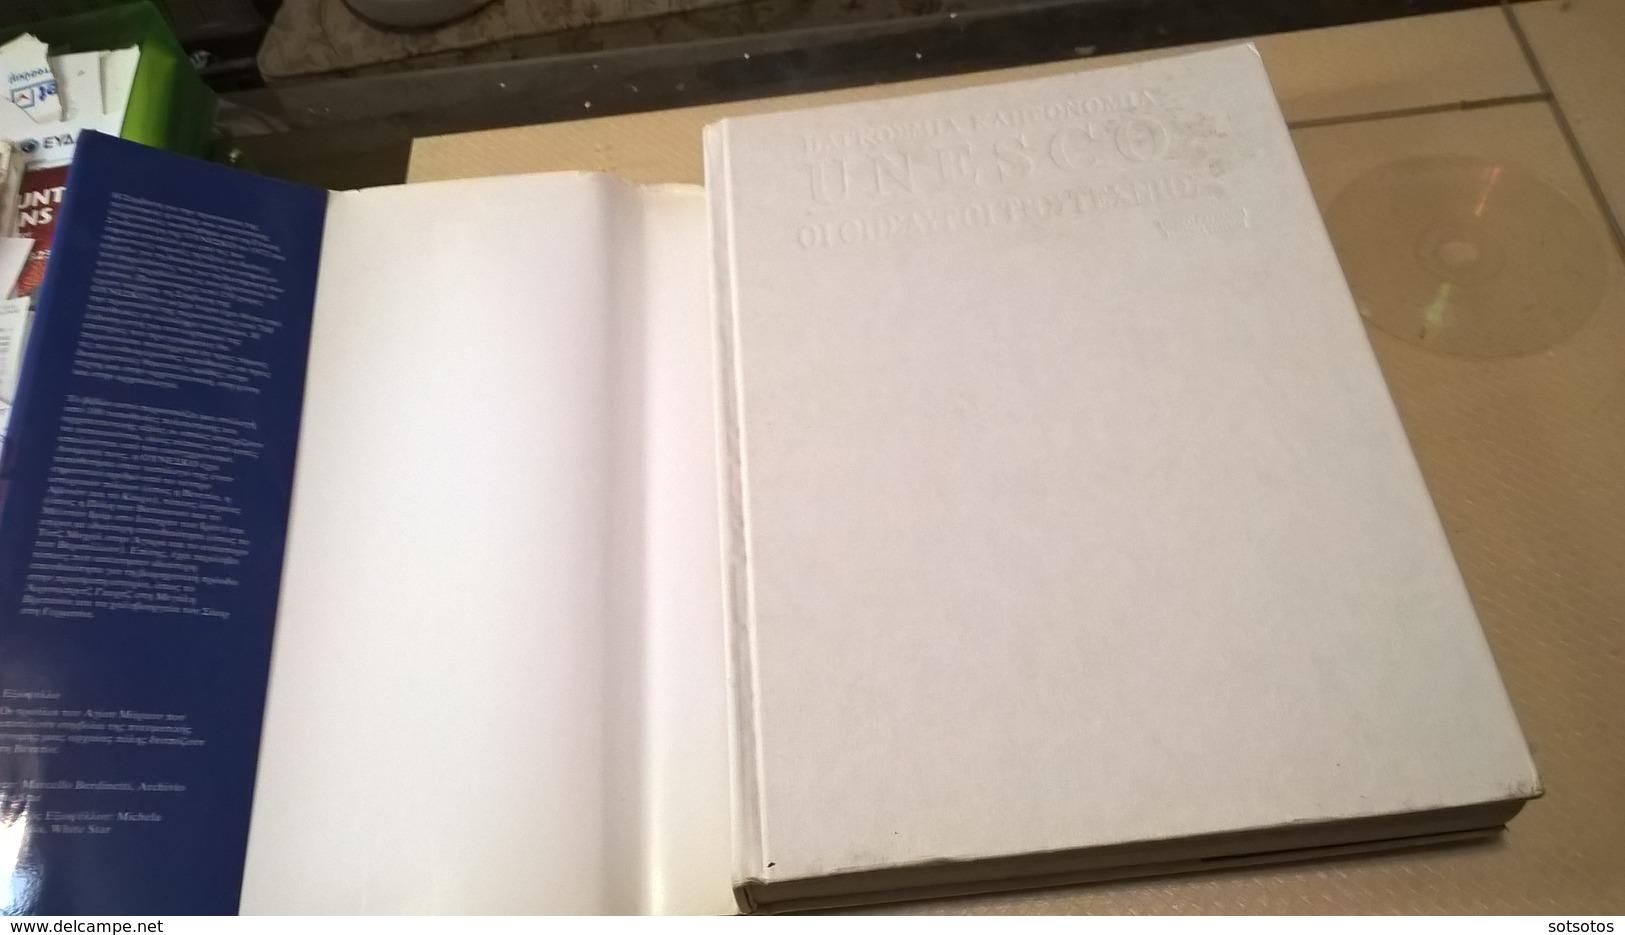 UNESCO: PROTECTED ΝATURAL AREAS - THESAURUS Of ART -Marco CATTANEO - Jasmina TRIFONI - Bücher, Zeitschriften, Comics